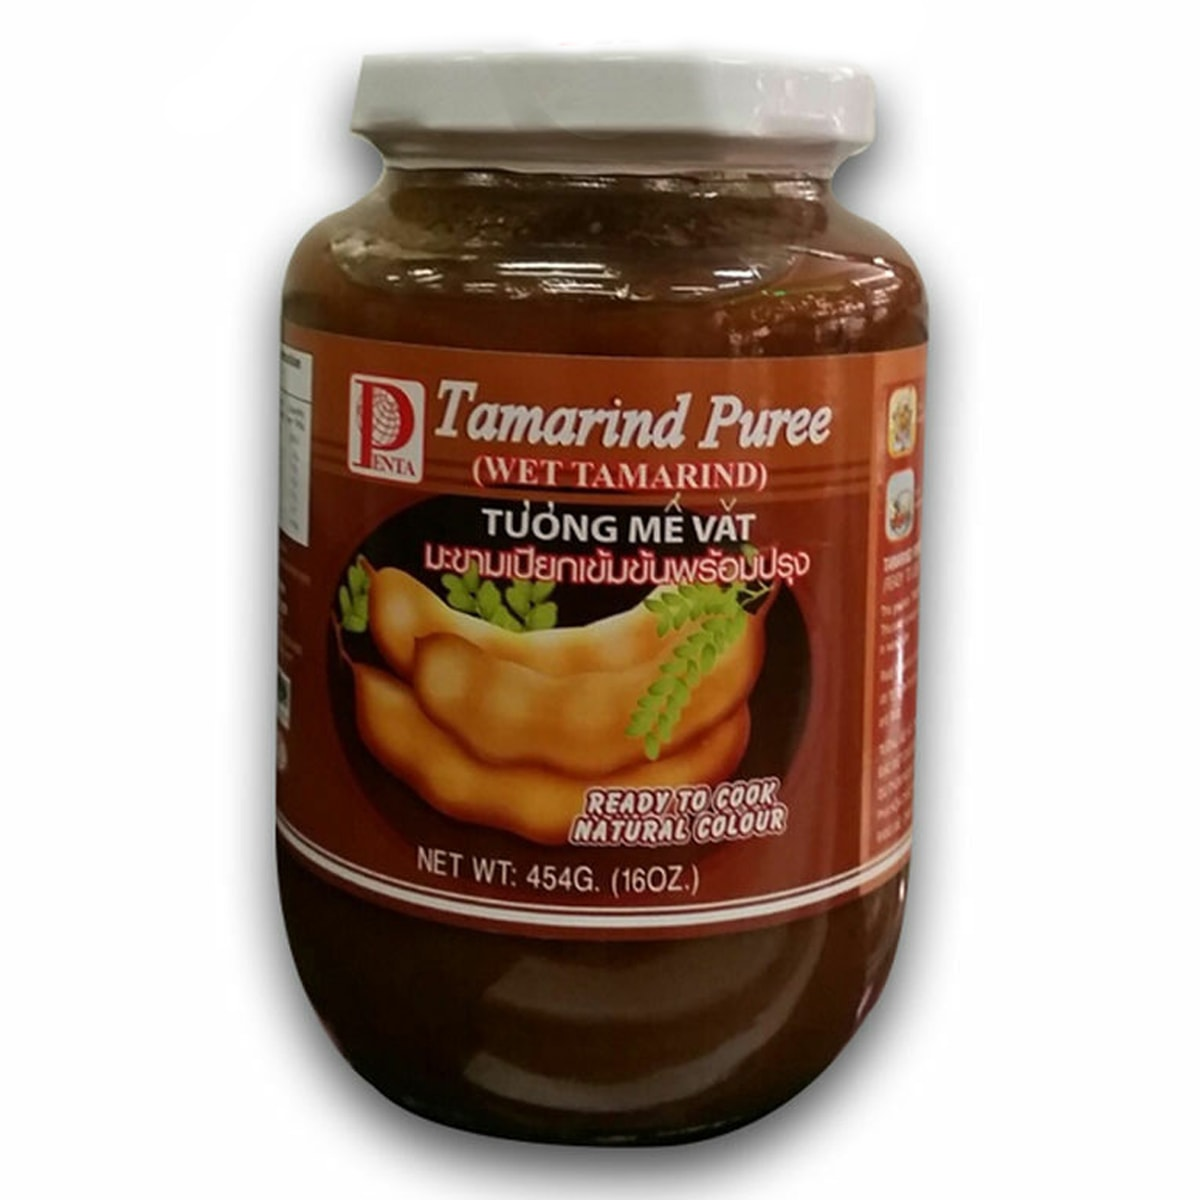 Buy Penta Tamarind Puree (Wet Tamarind Tuong Me Vat) - 454 gm